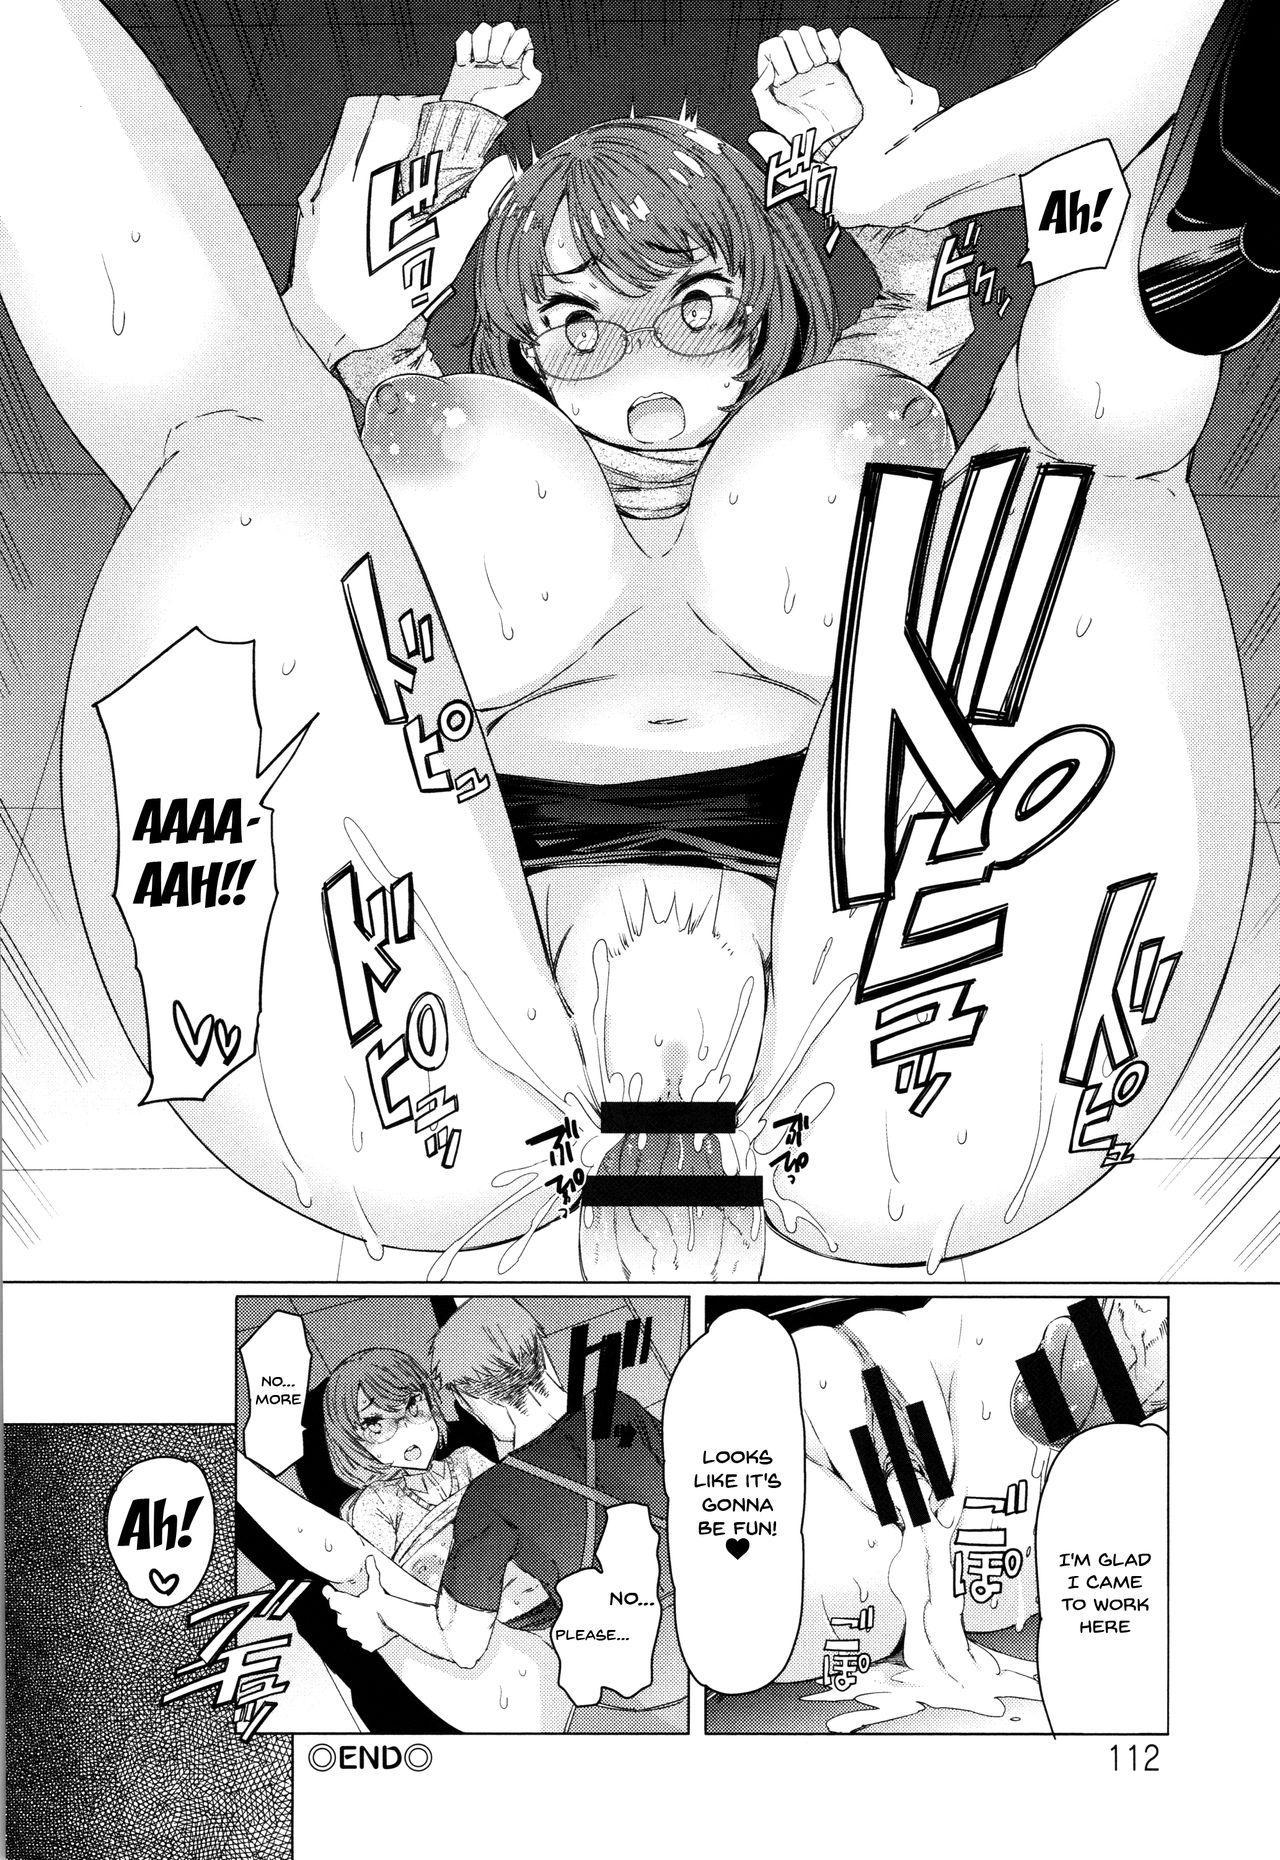 Hitozuma ga Ero Sugite Shigoto ni Naranai! | These Housewives Are Too Lewd I Can't Help It! 111